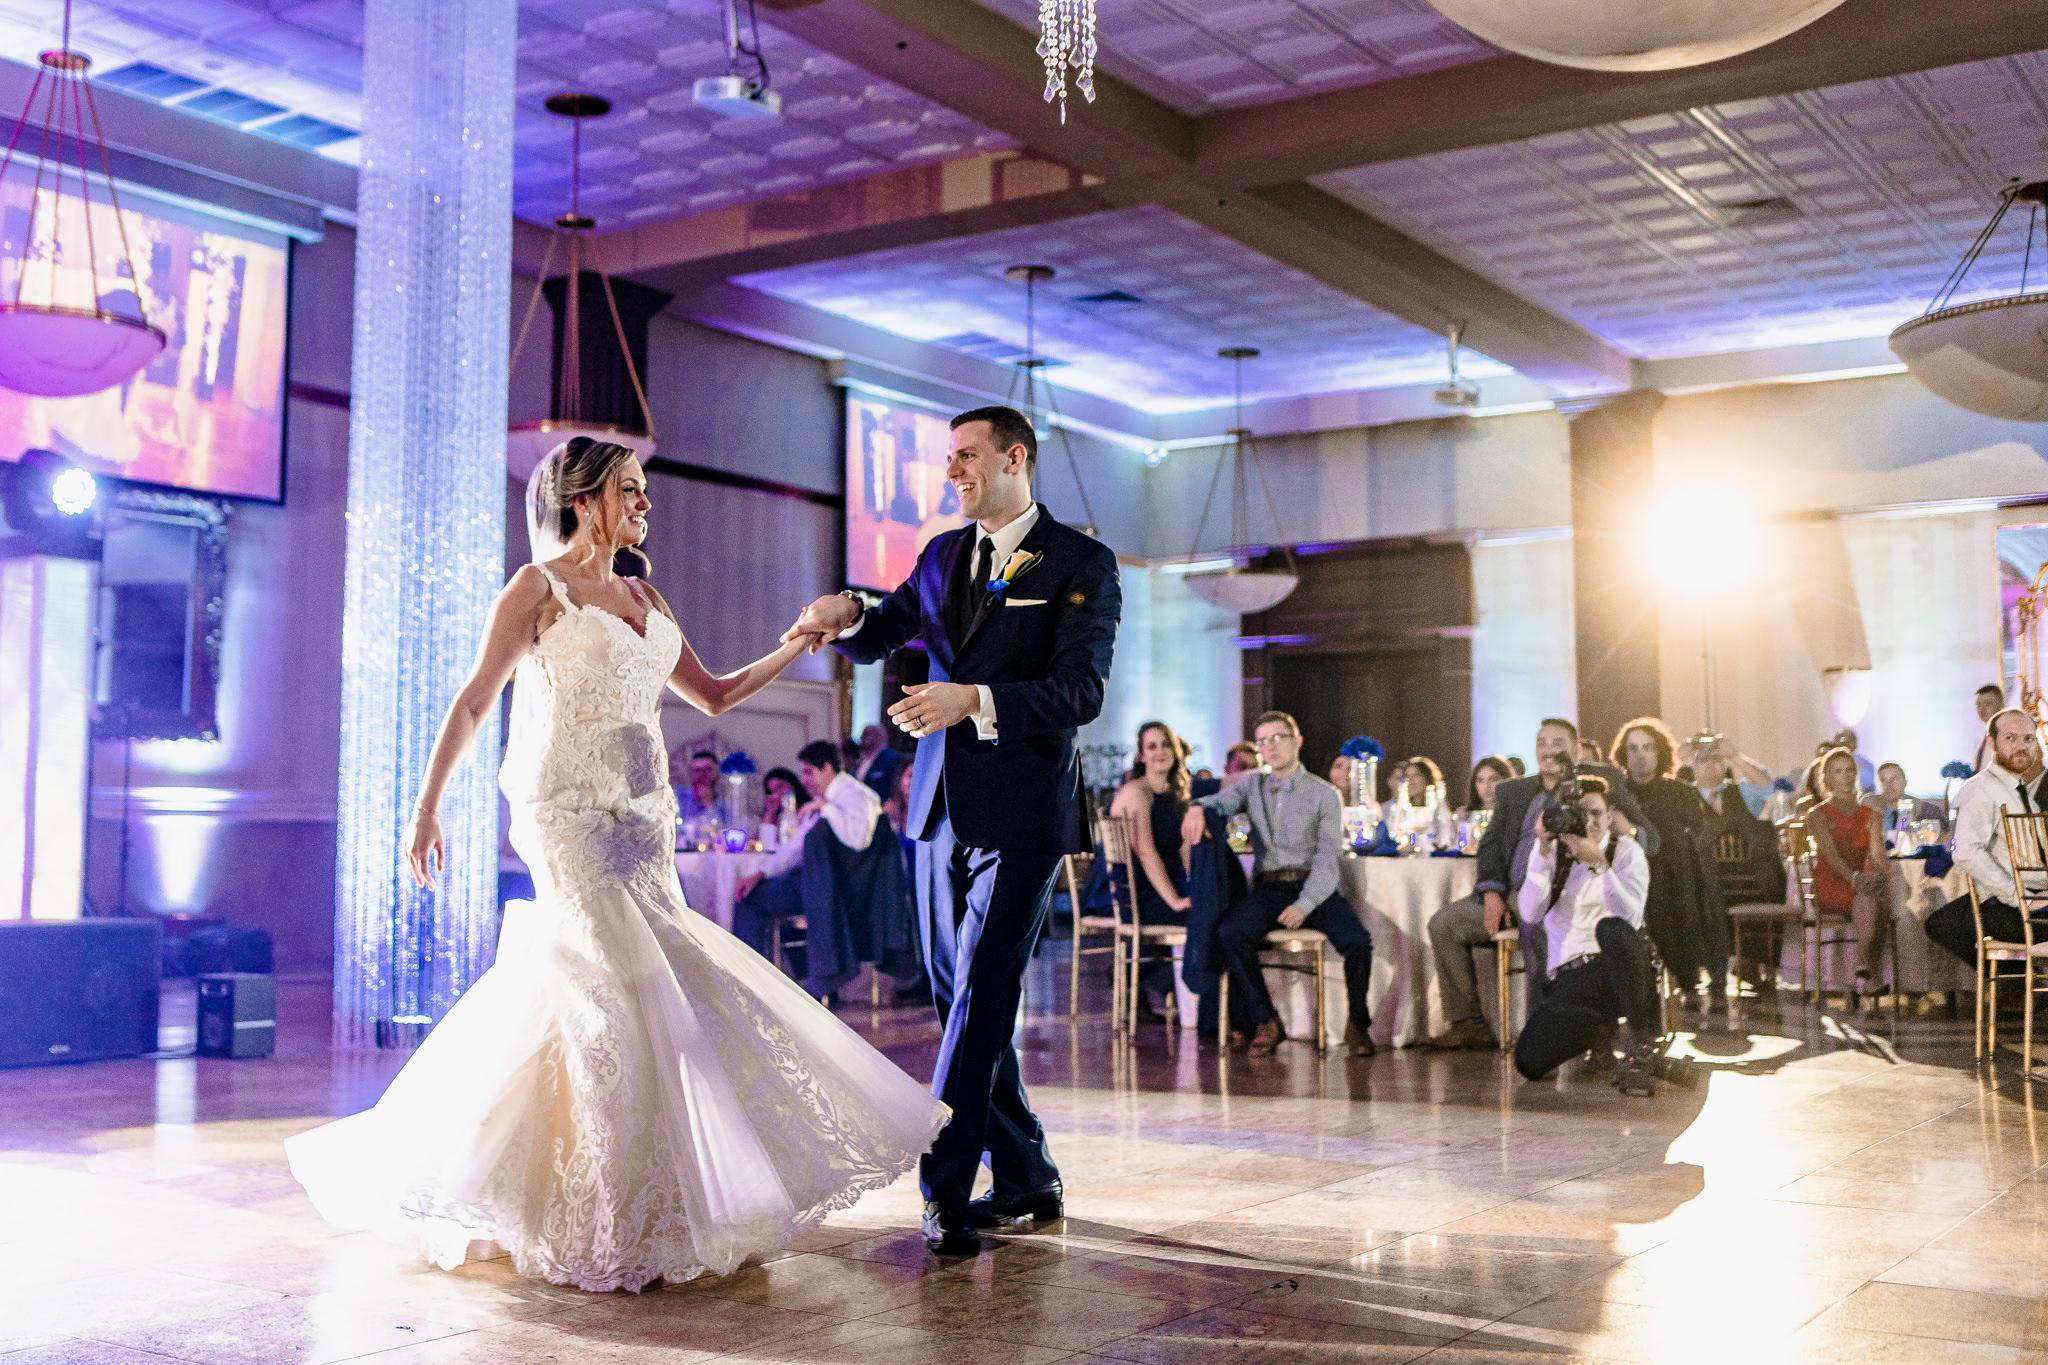 Brennan-South-Gate-Manor-New-Jersey-Wedding-Photographer-28.JPG